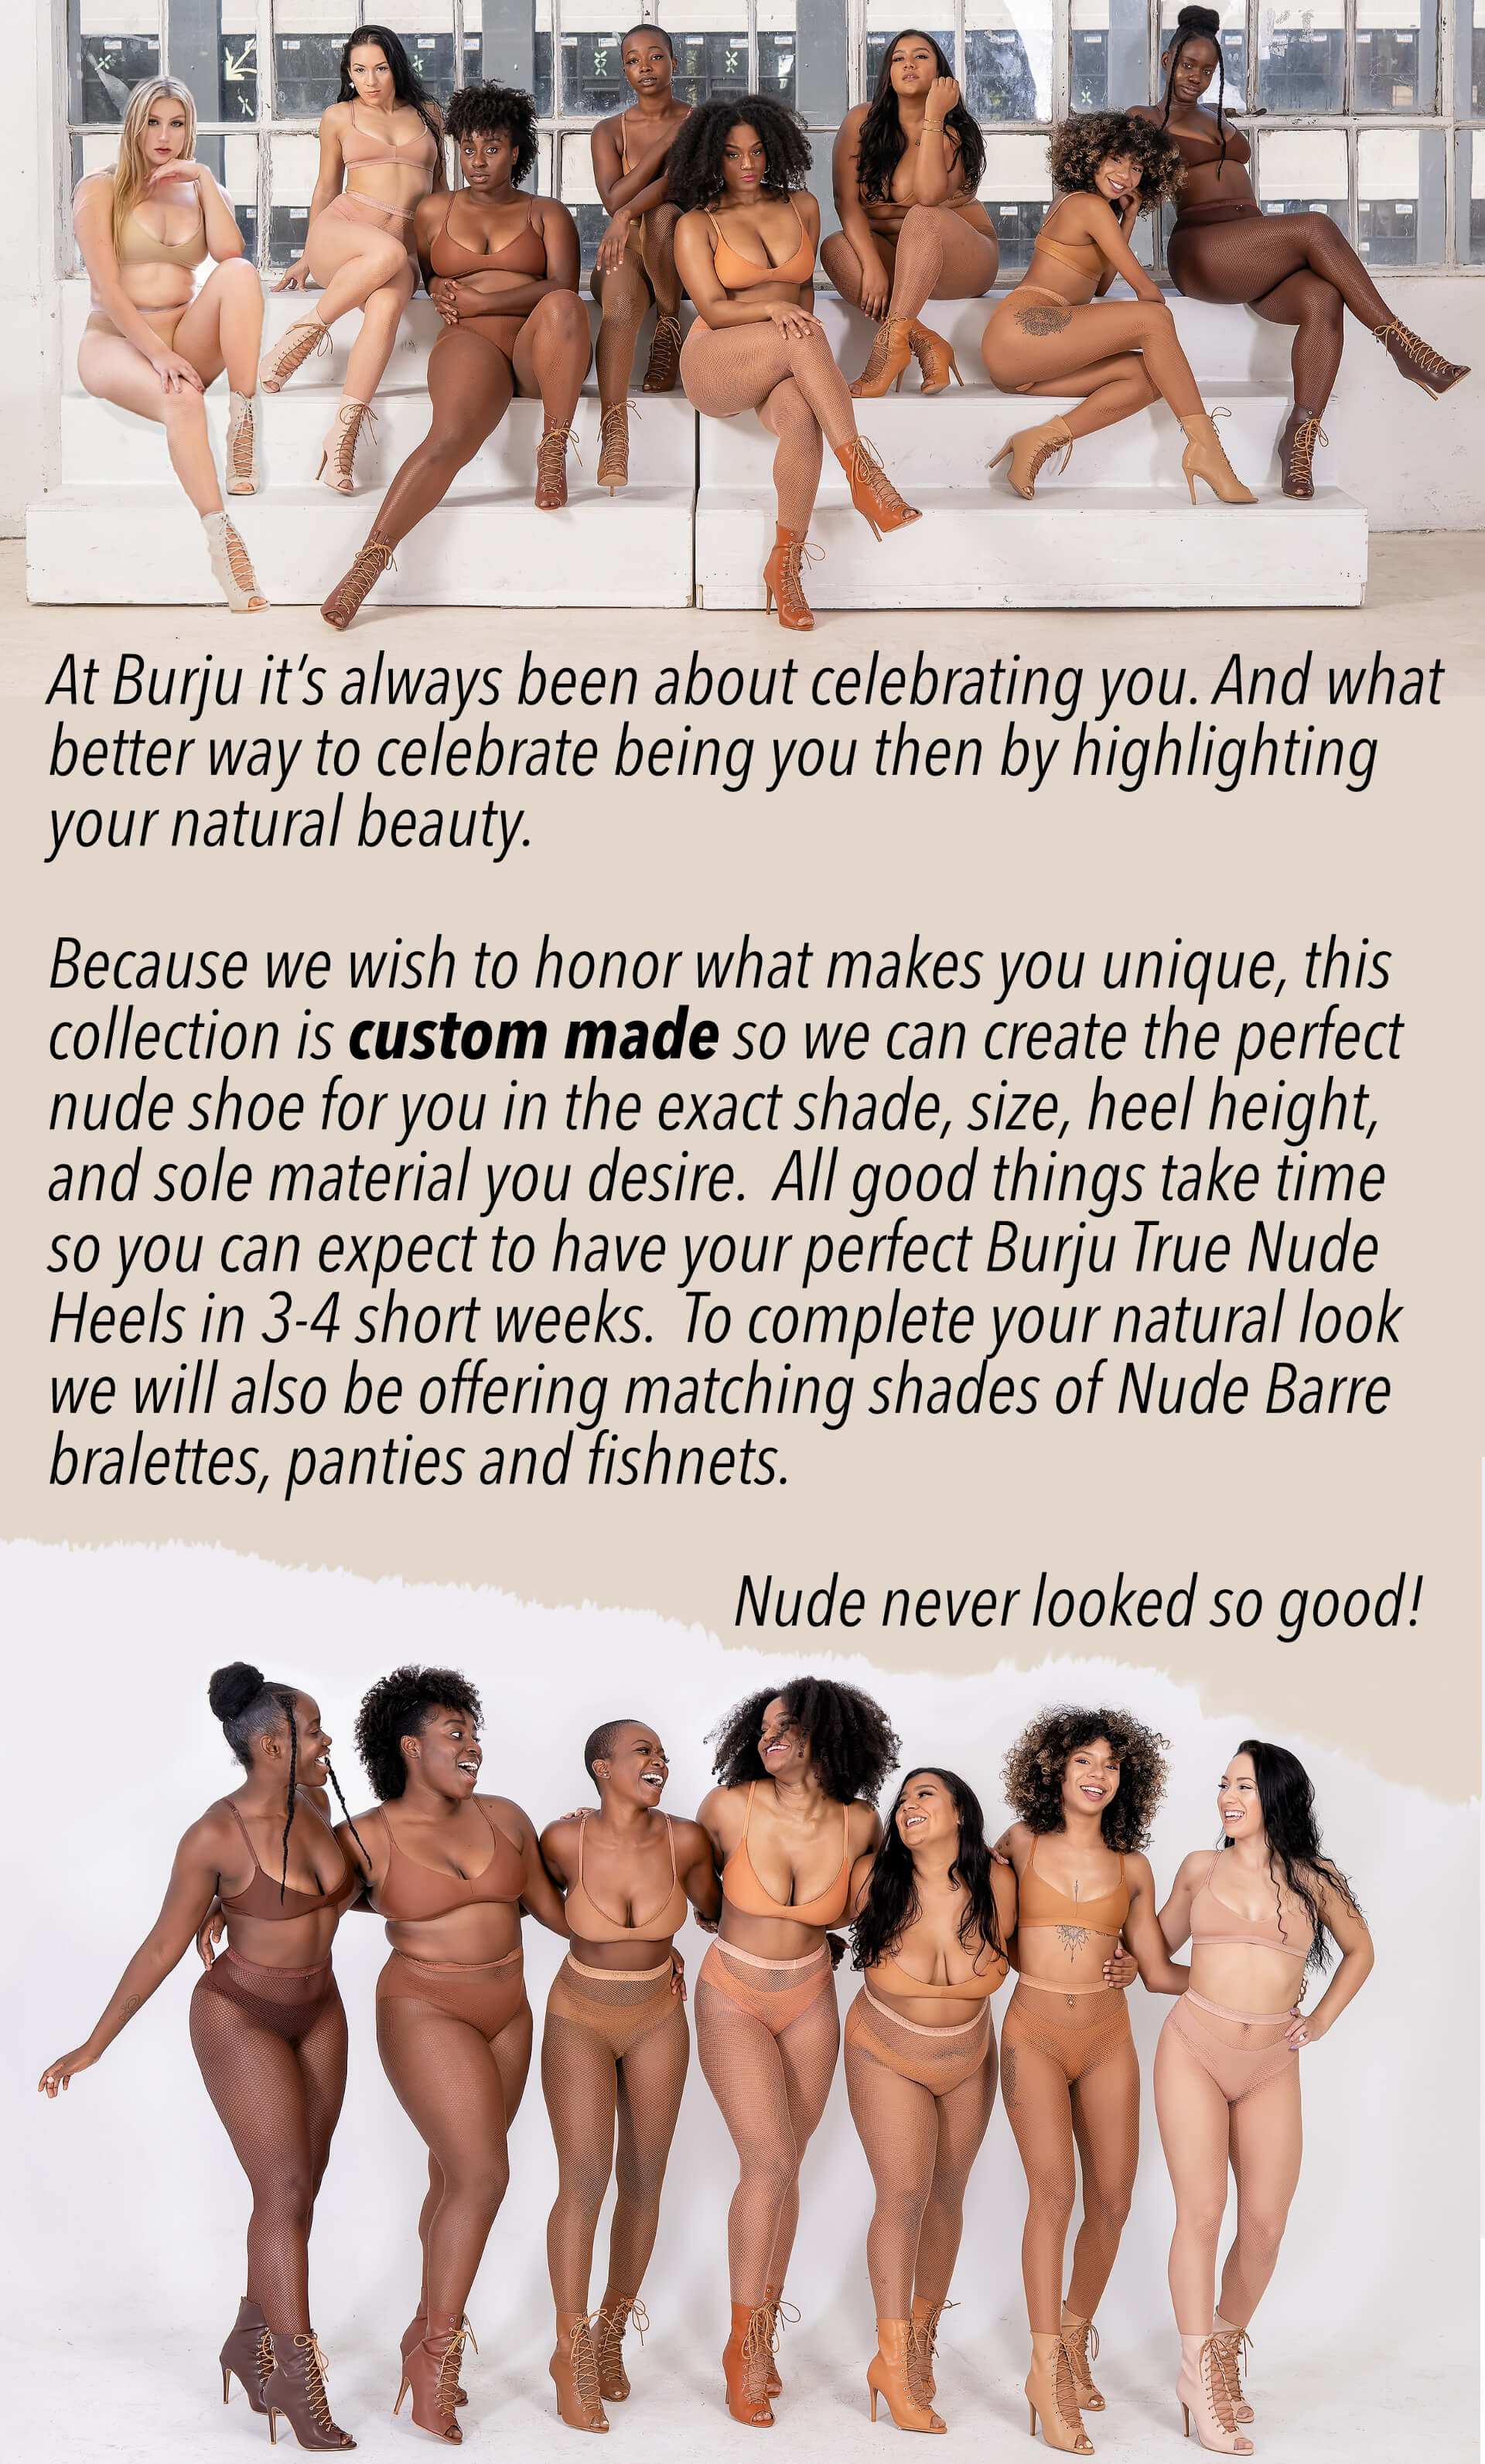 true-nude-category-intro-2.jpg